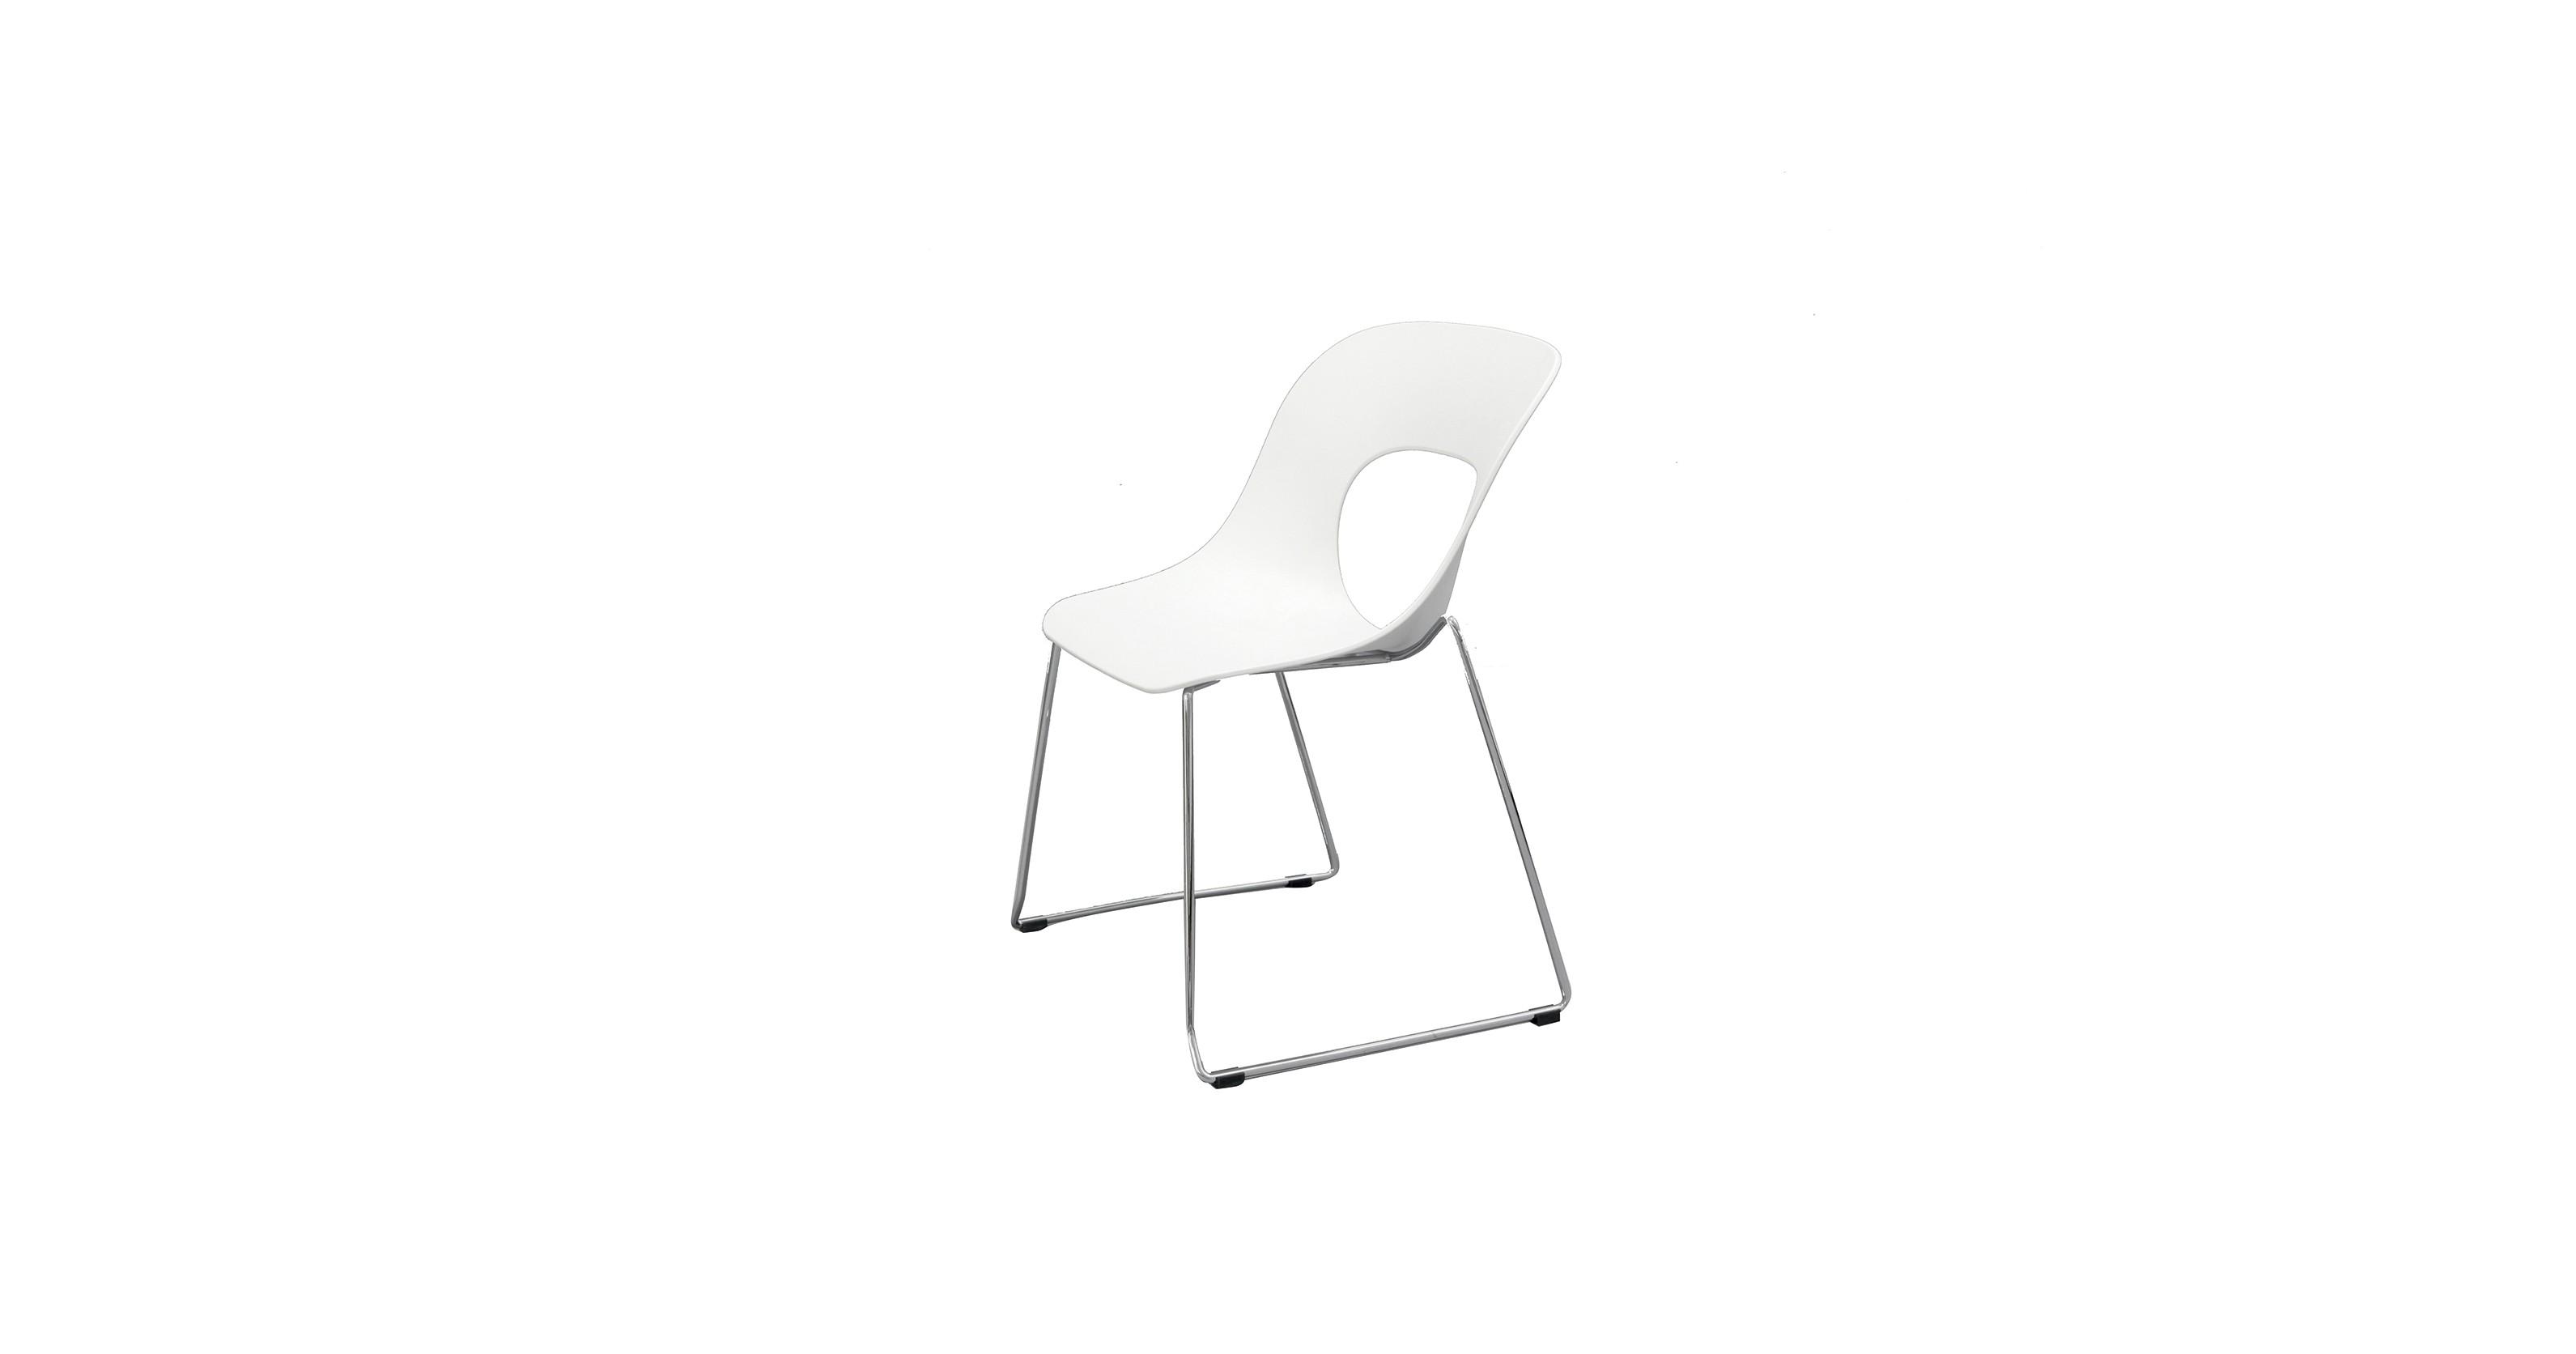 Стул HOLE-05 белыйОбеденные стулья<br><br><br>Material: Пластик<br>Width см: 63<br>Depth см: 56<br>Height см: 82